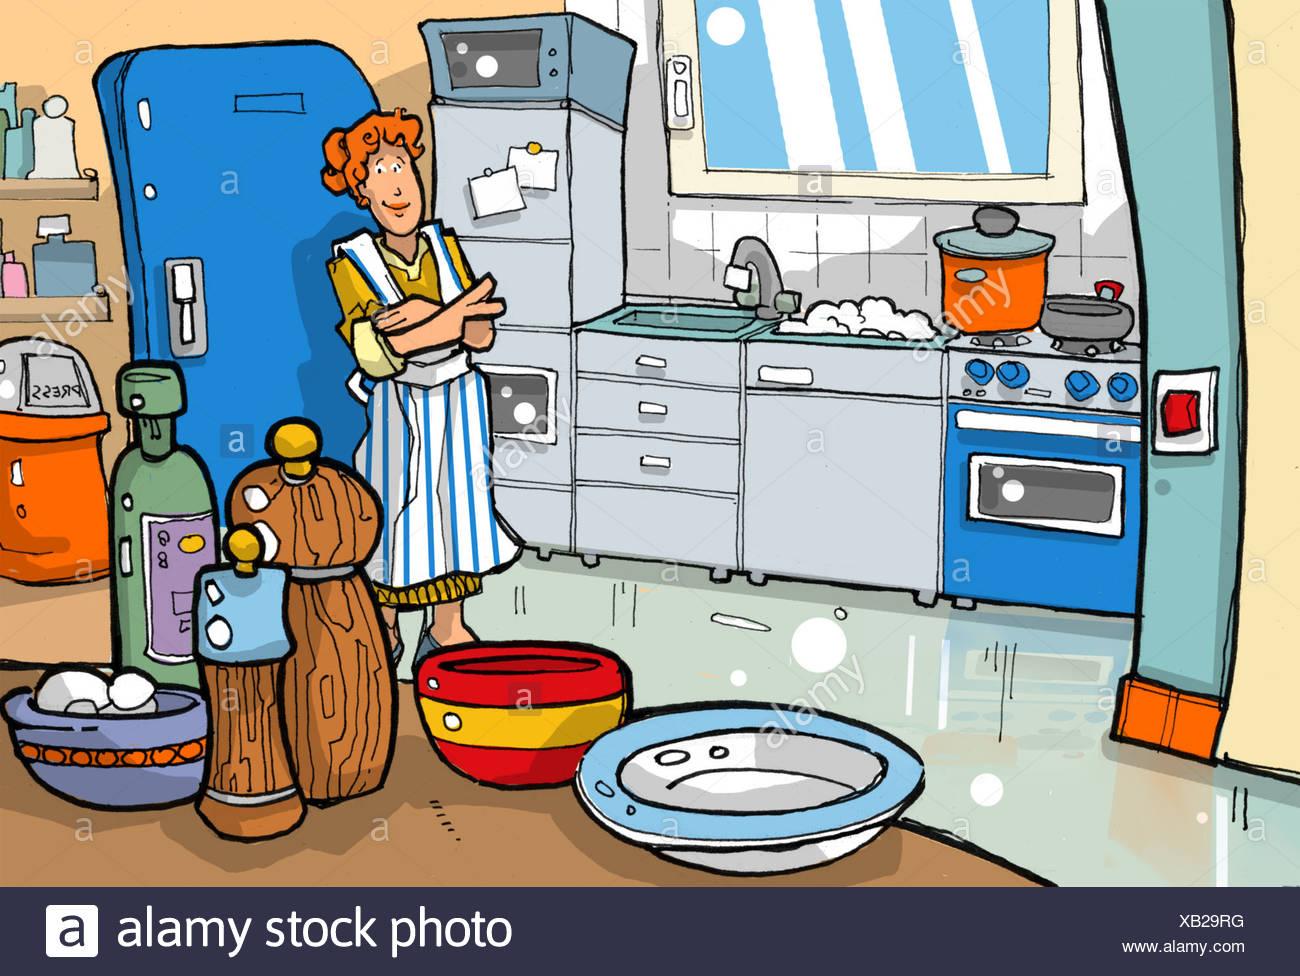 Kitchen Chaos Woman Stock Photos & Kitchen Chaos Woman Stock Images ...